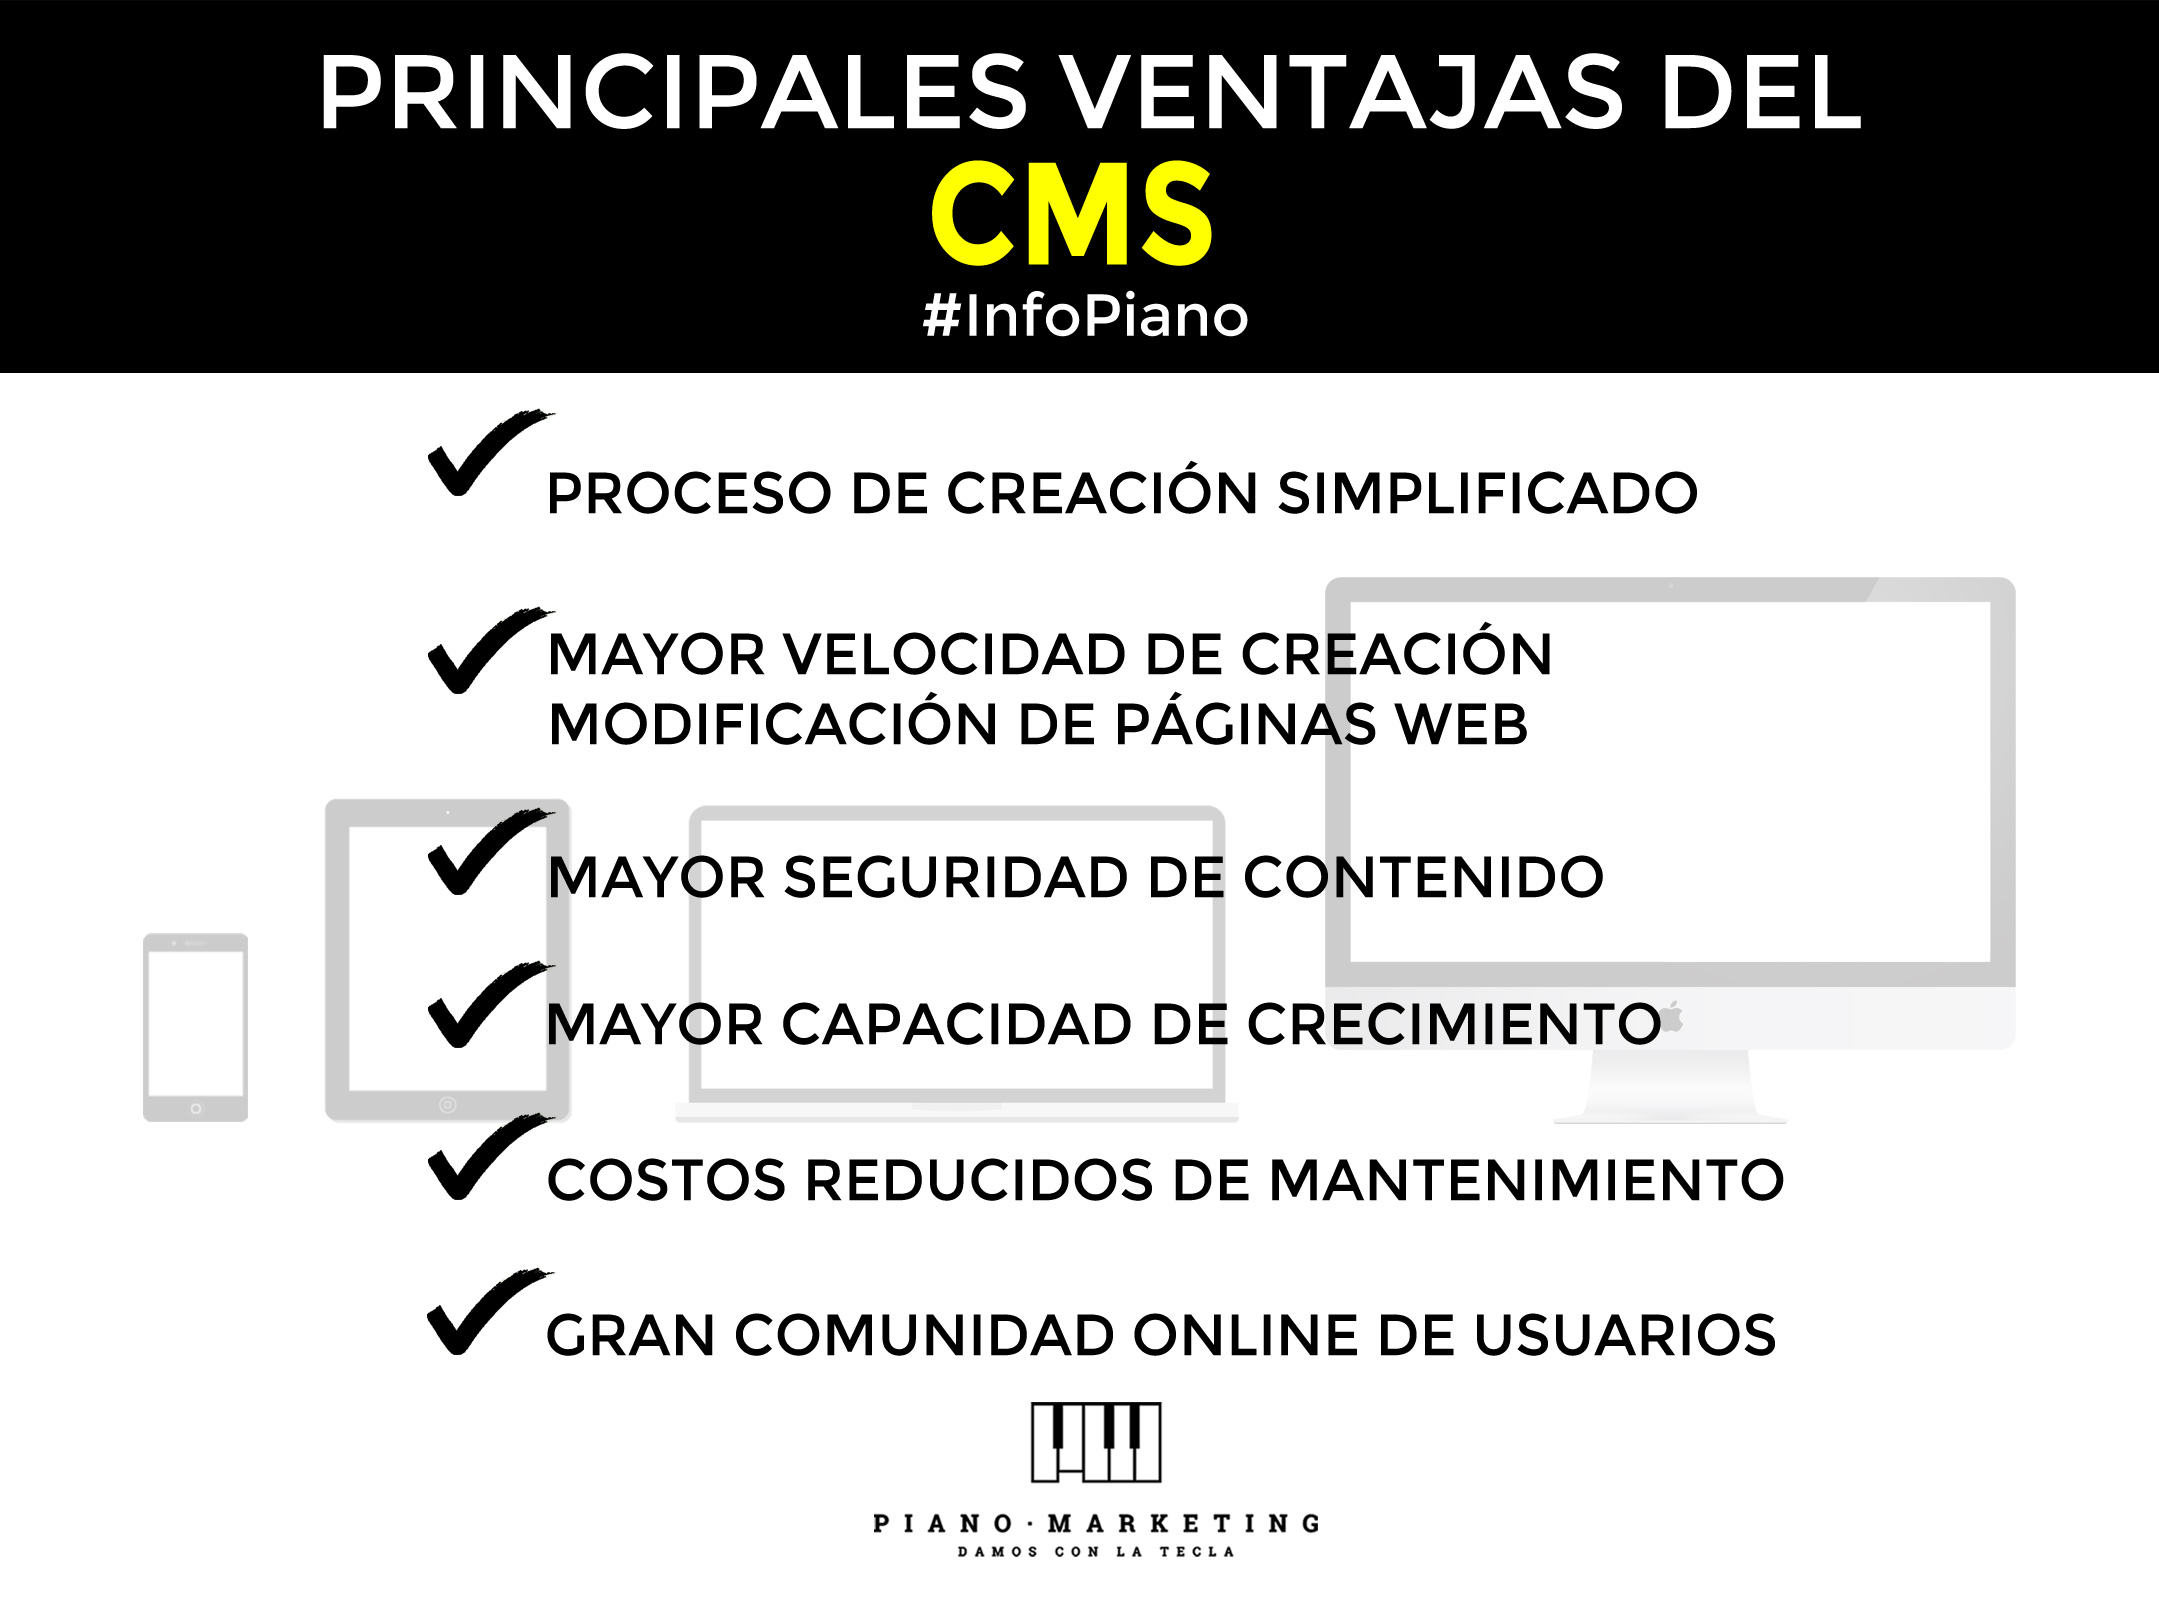 CMS BENEFITS